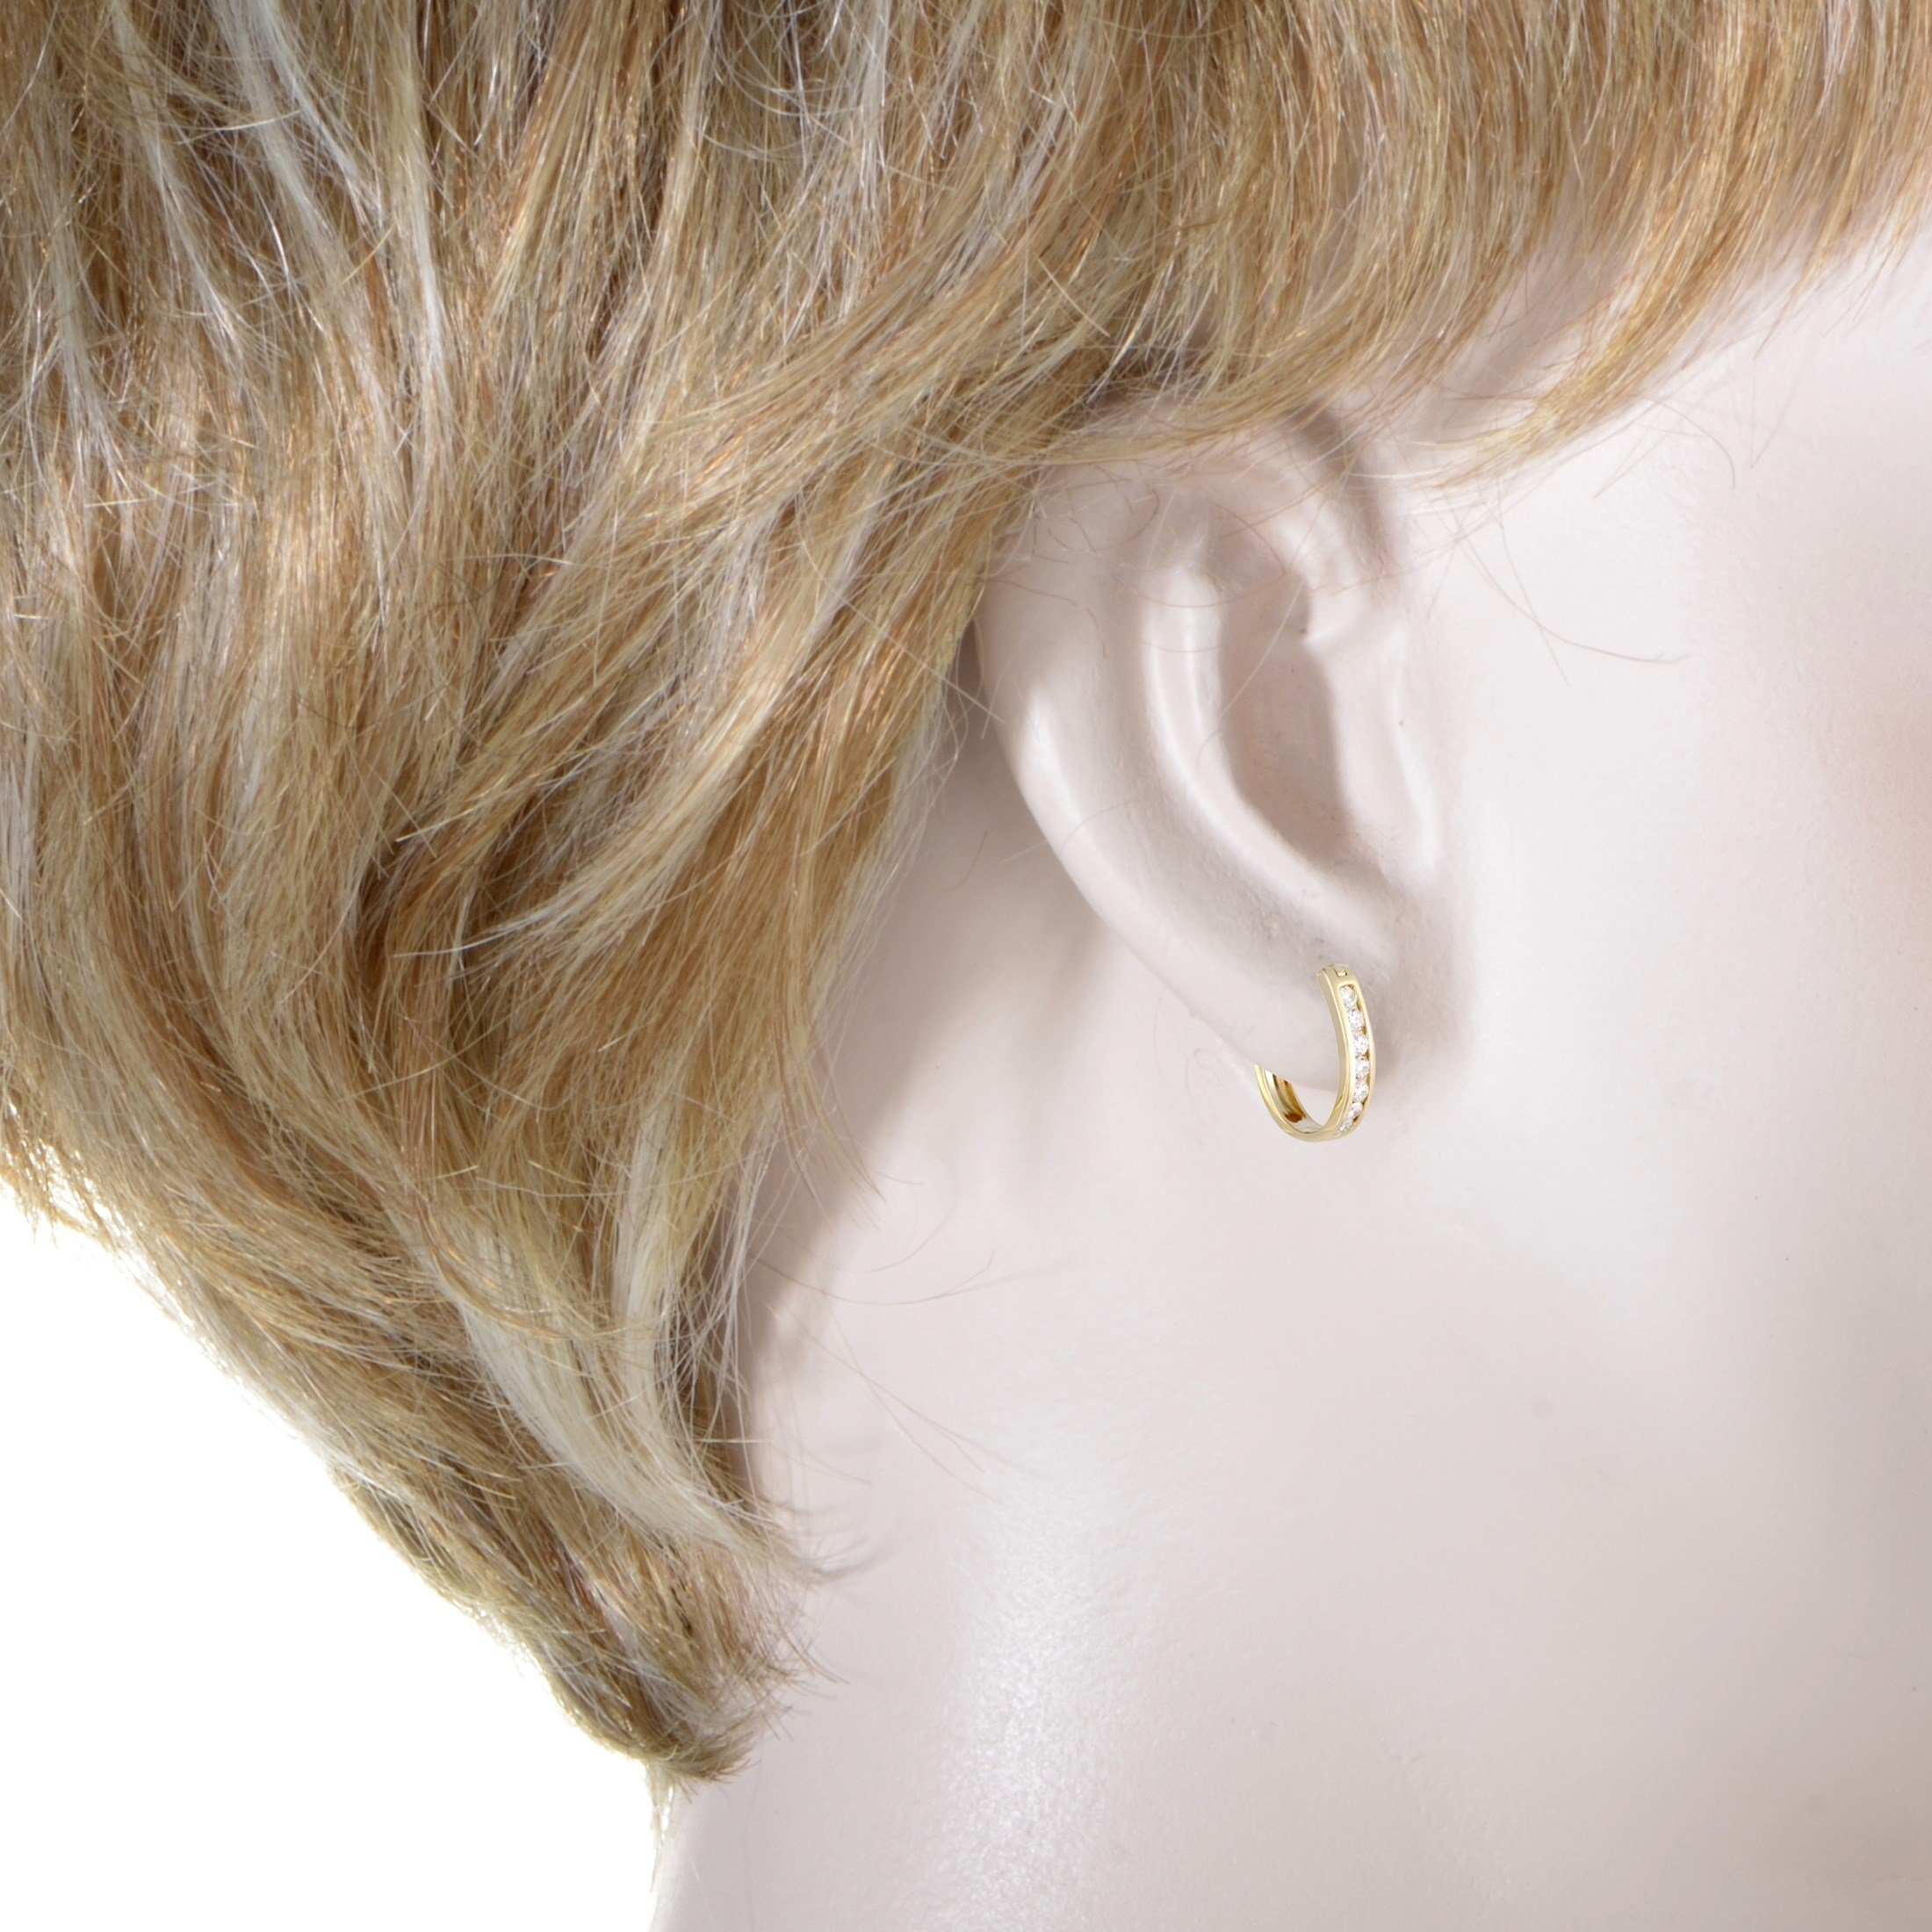 0.5 Carat (ctw) Diamond Channel Horseshoe Hoop Earrings in 14K Yellow Gold; 1/2 CT White Diamonds (G Color, SI1-SI2 Clarity) in 0.75'' Hoops by Luxury Bazaar (Image #2)